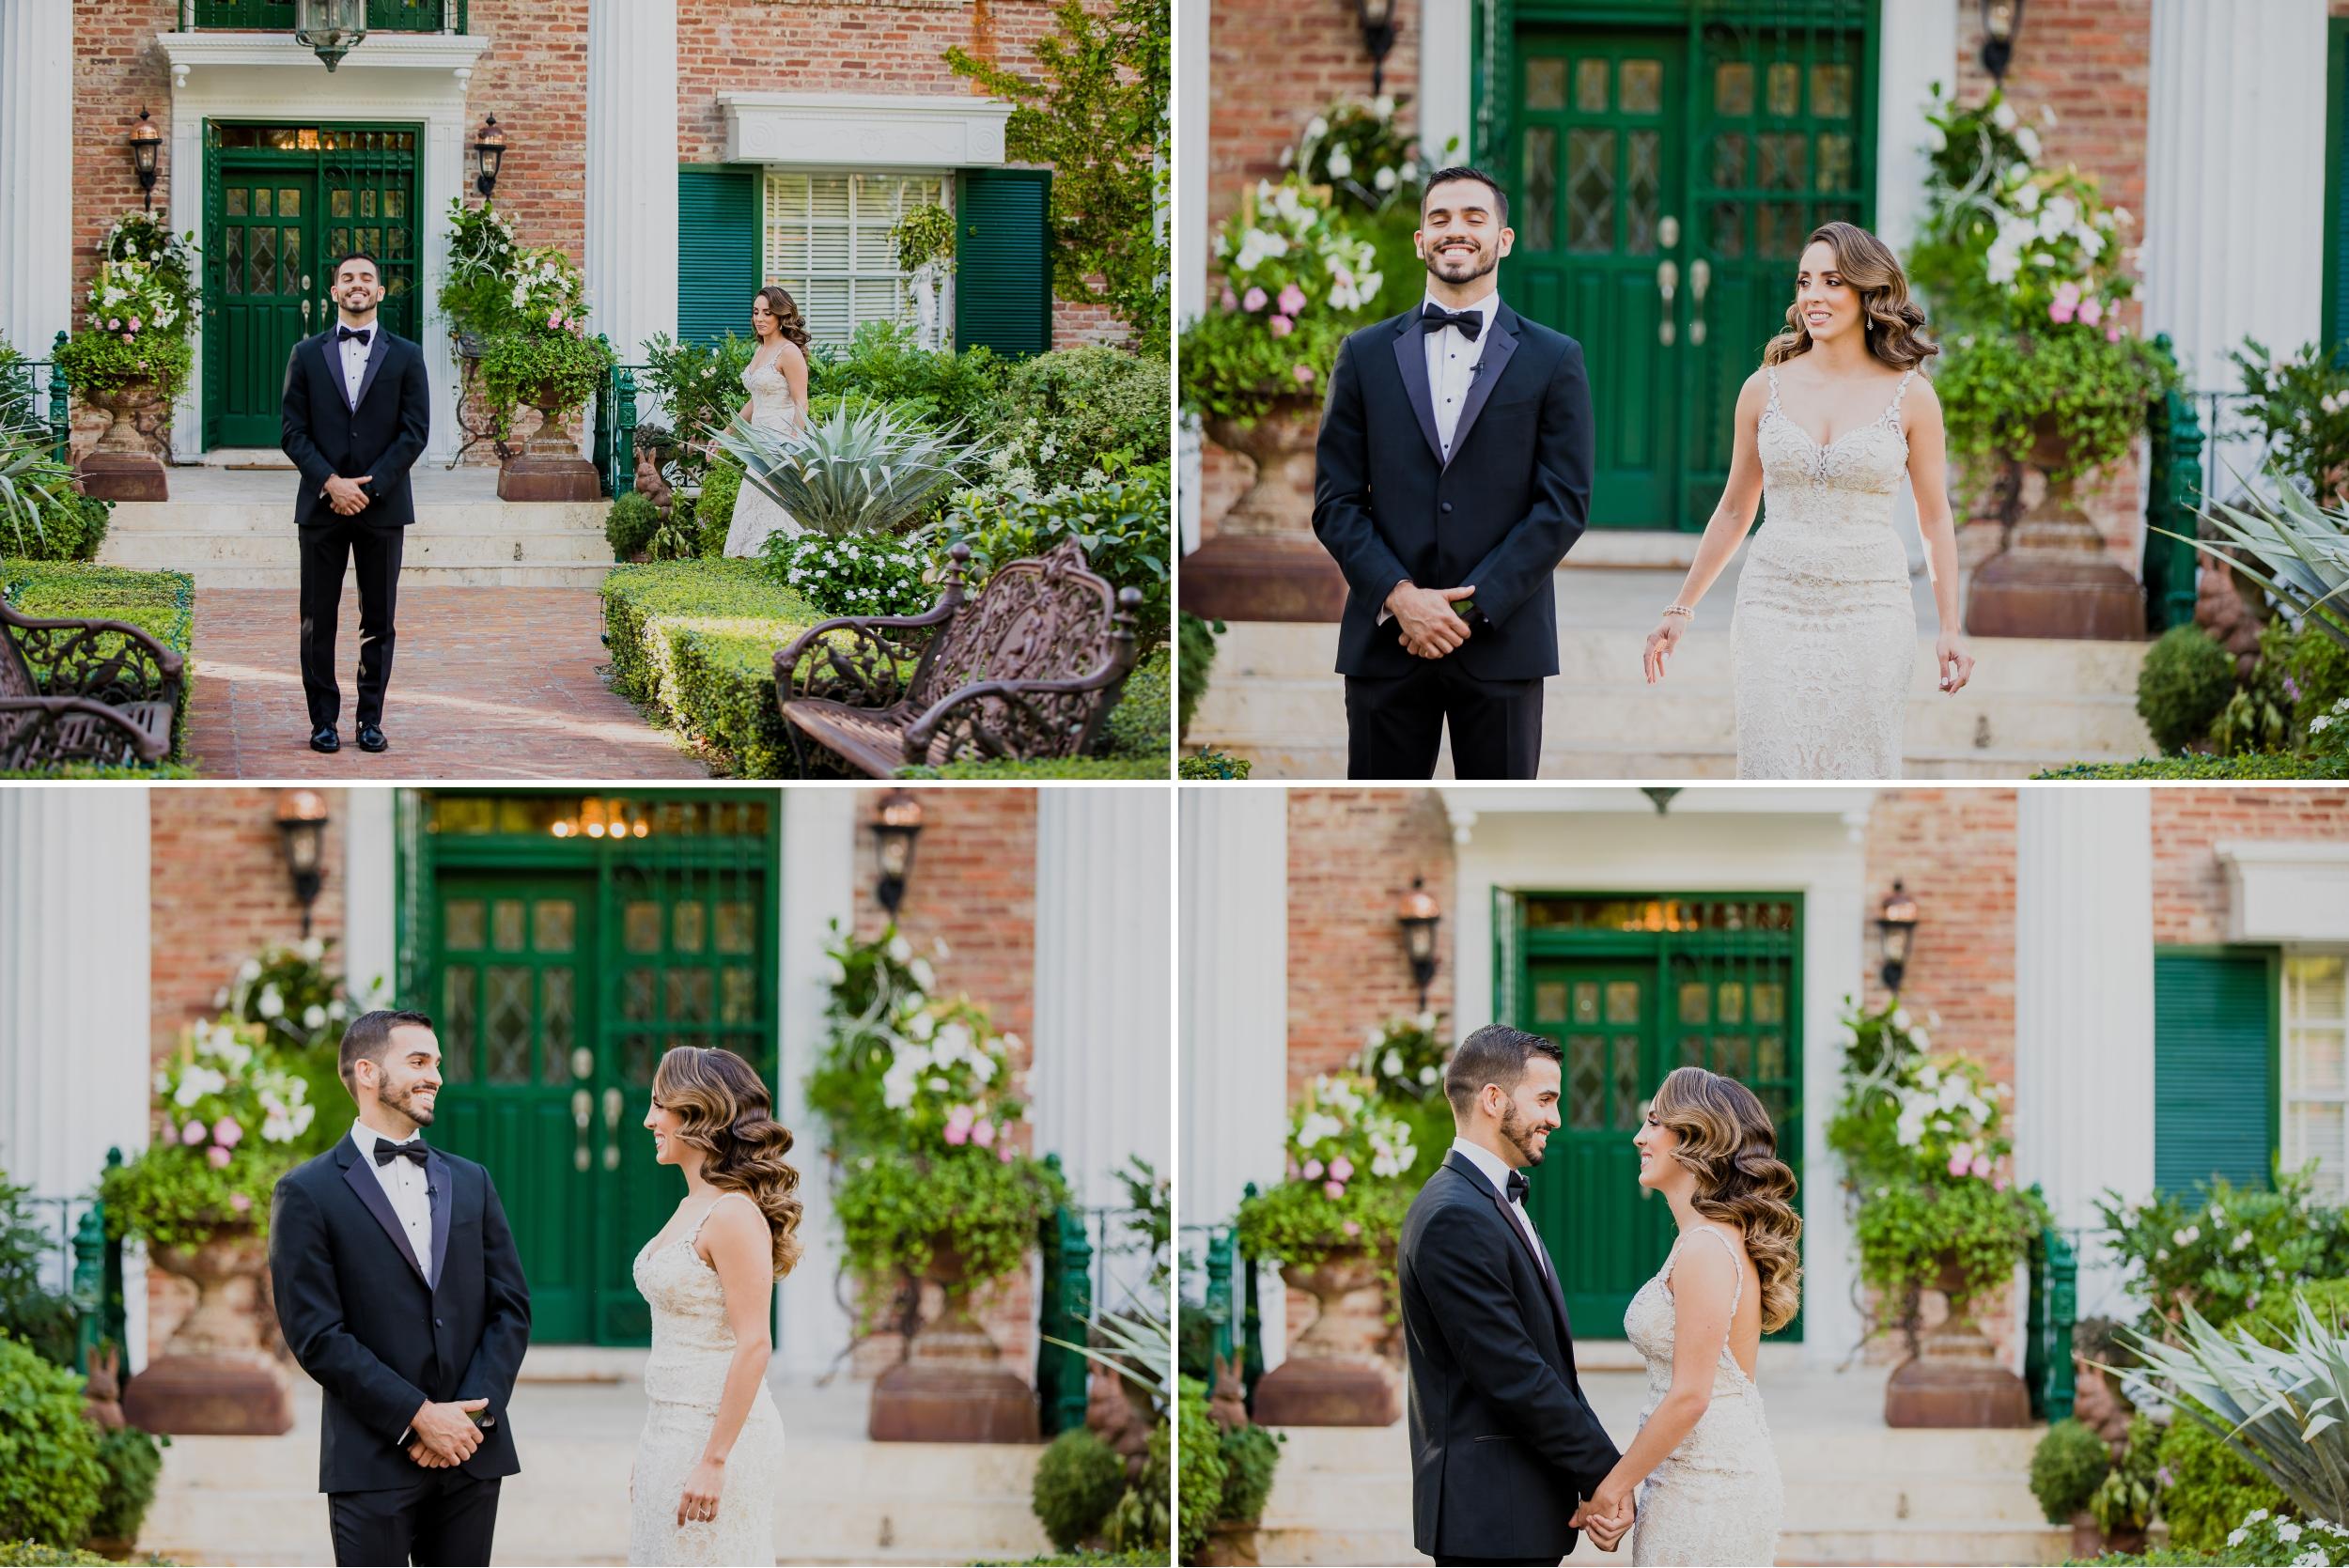 Wedding Miller Plantation Photography by Santy Martinez 6.jpg